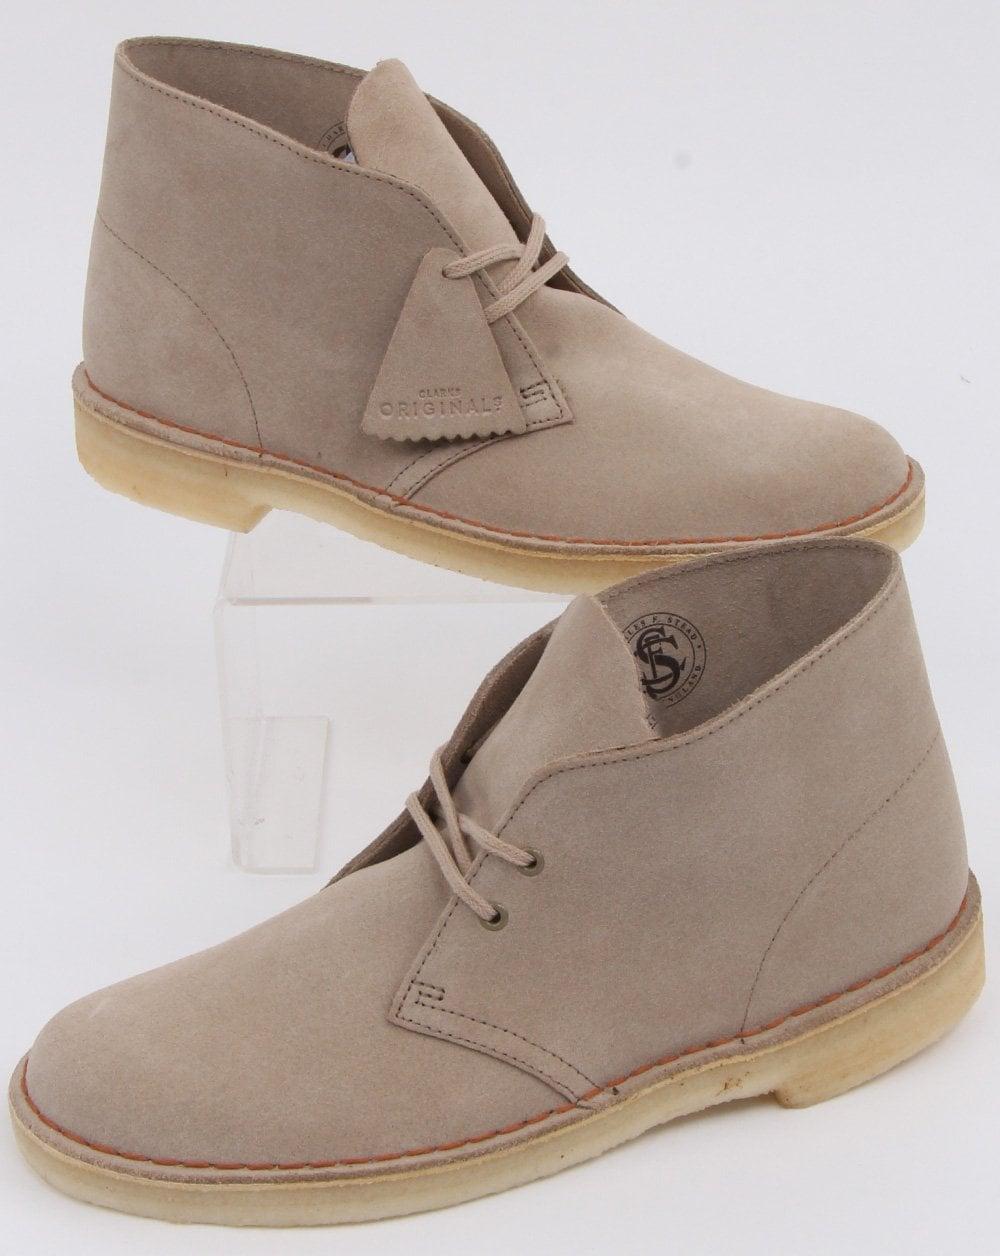 932d9ebd8f4 Clarks Originals Suede Desert Boot Sand Suede